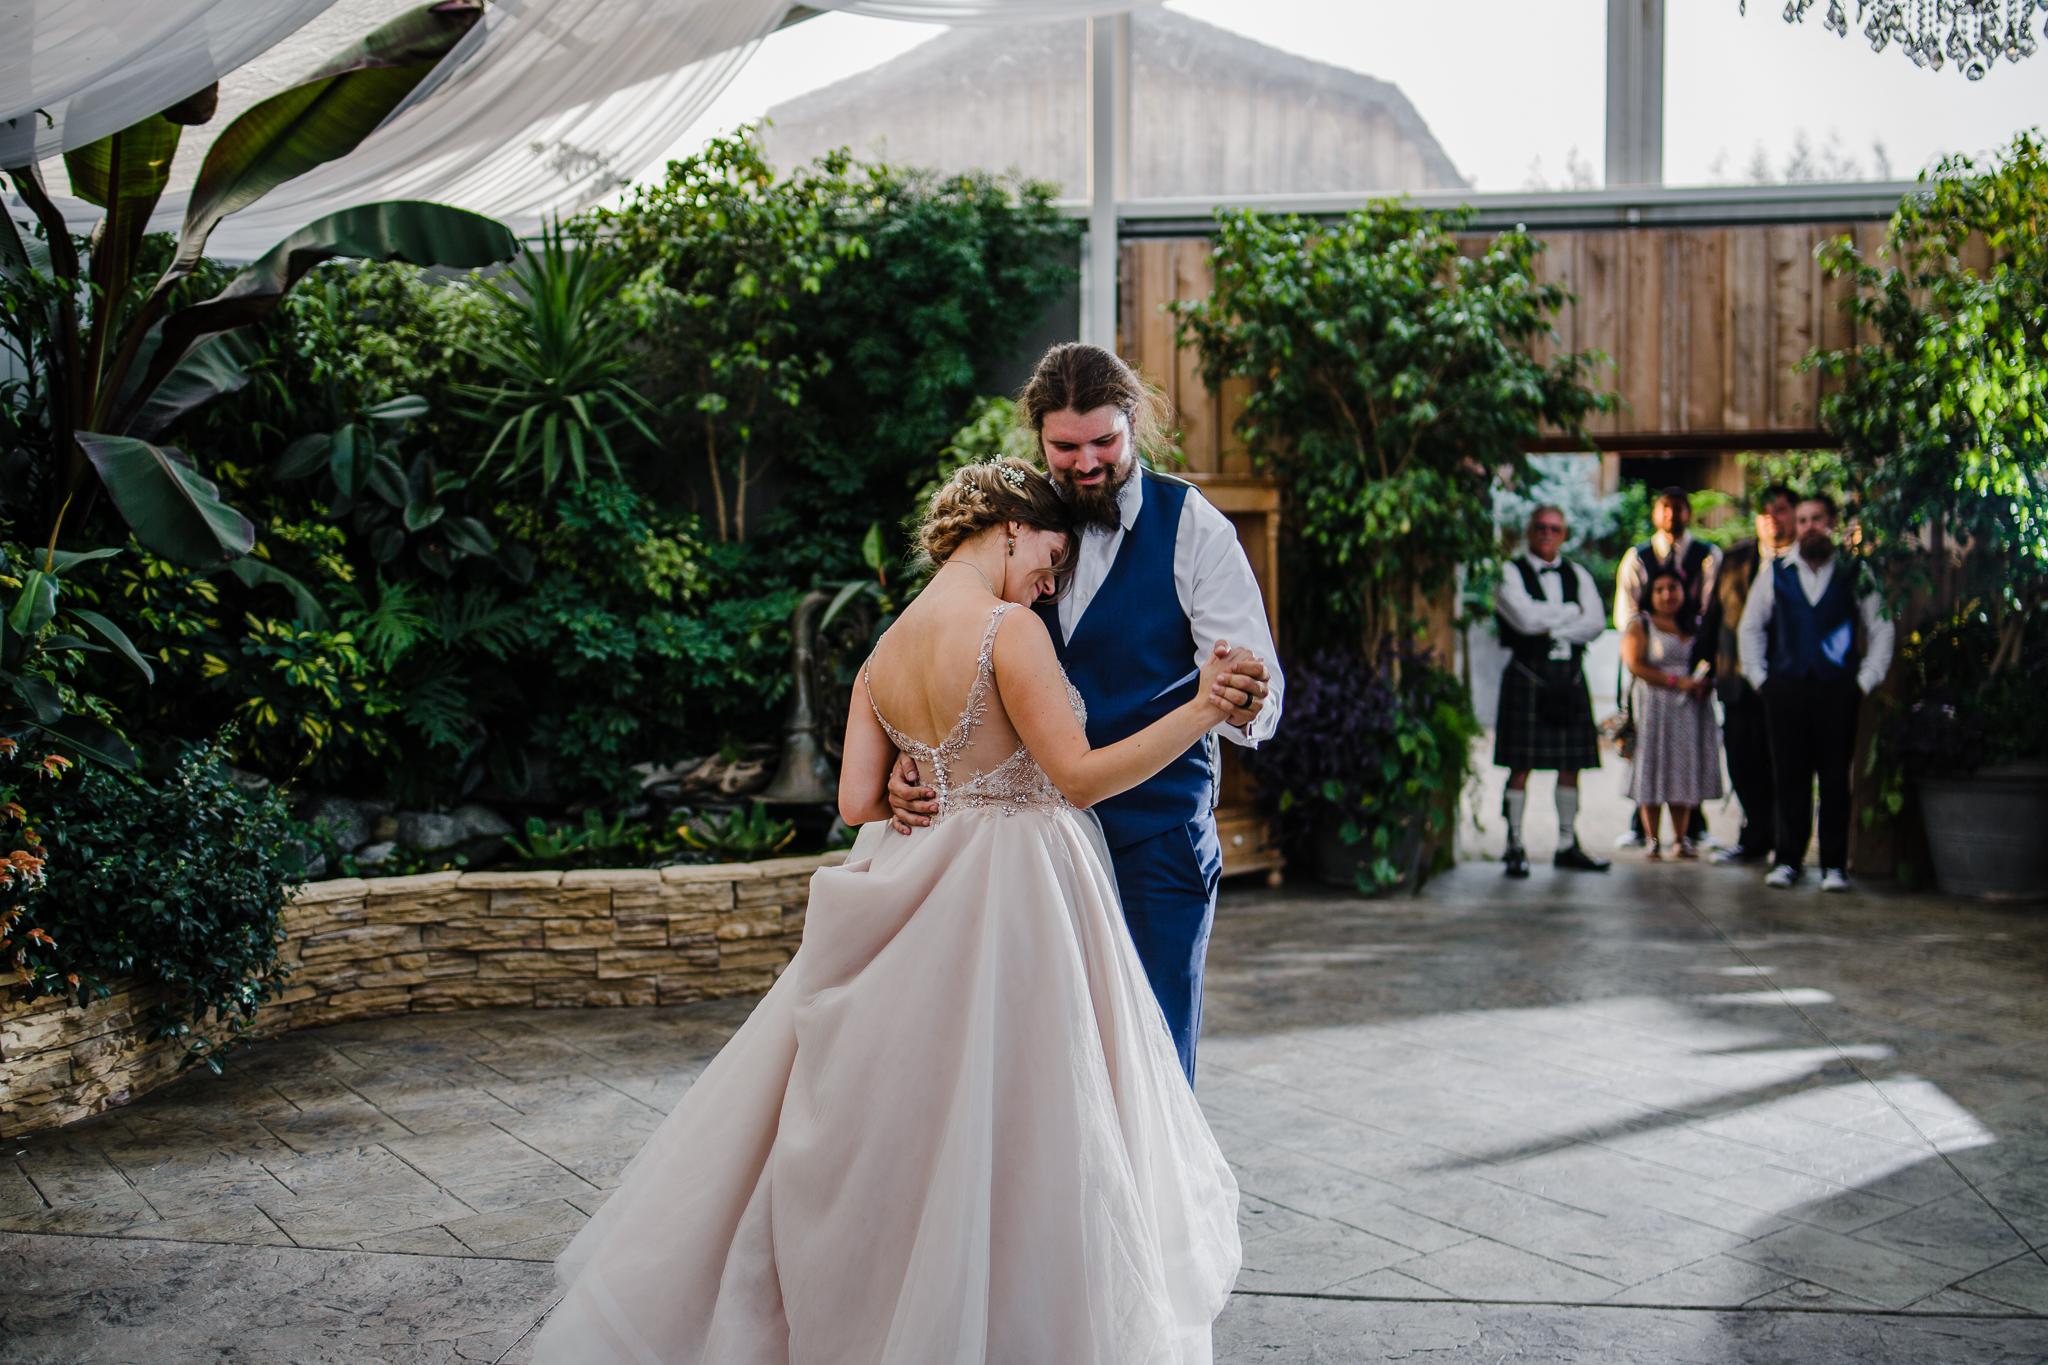 Secret_Garden_Woodbridge_Farms_Wedding_Photographer_Summer_Disney_Princess_Blush_Pink-017.jpg